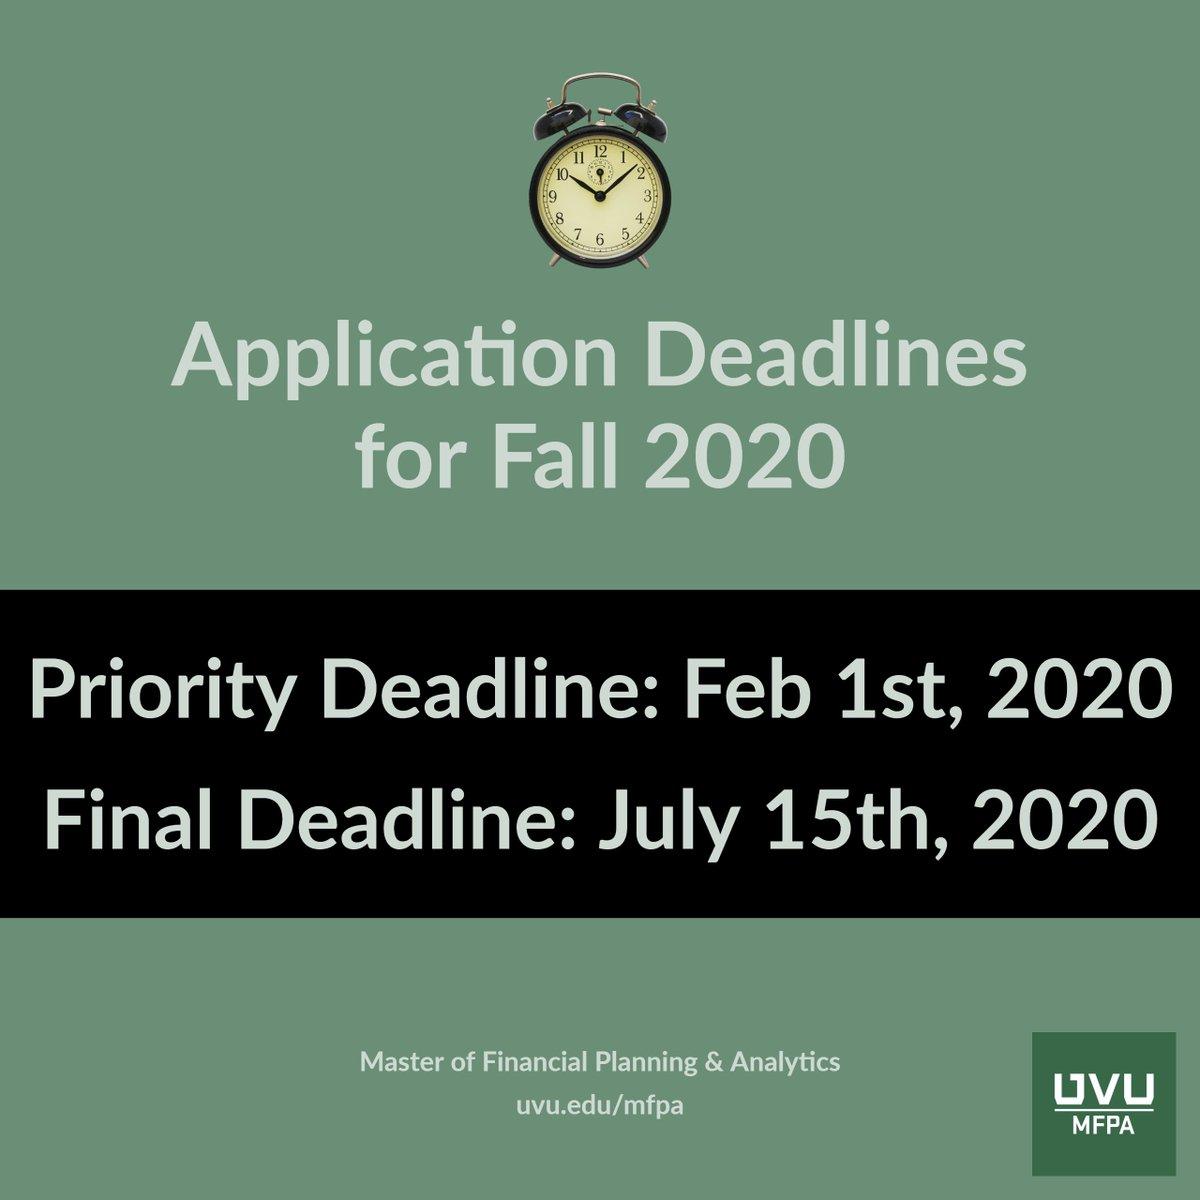 Uvu 2020 Summer Schedule.Uvu Mfpa Uvumfpa Twitter